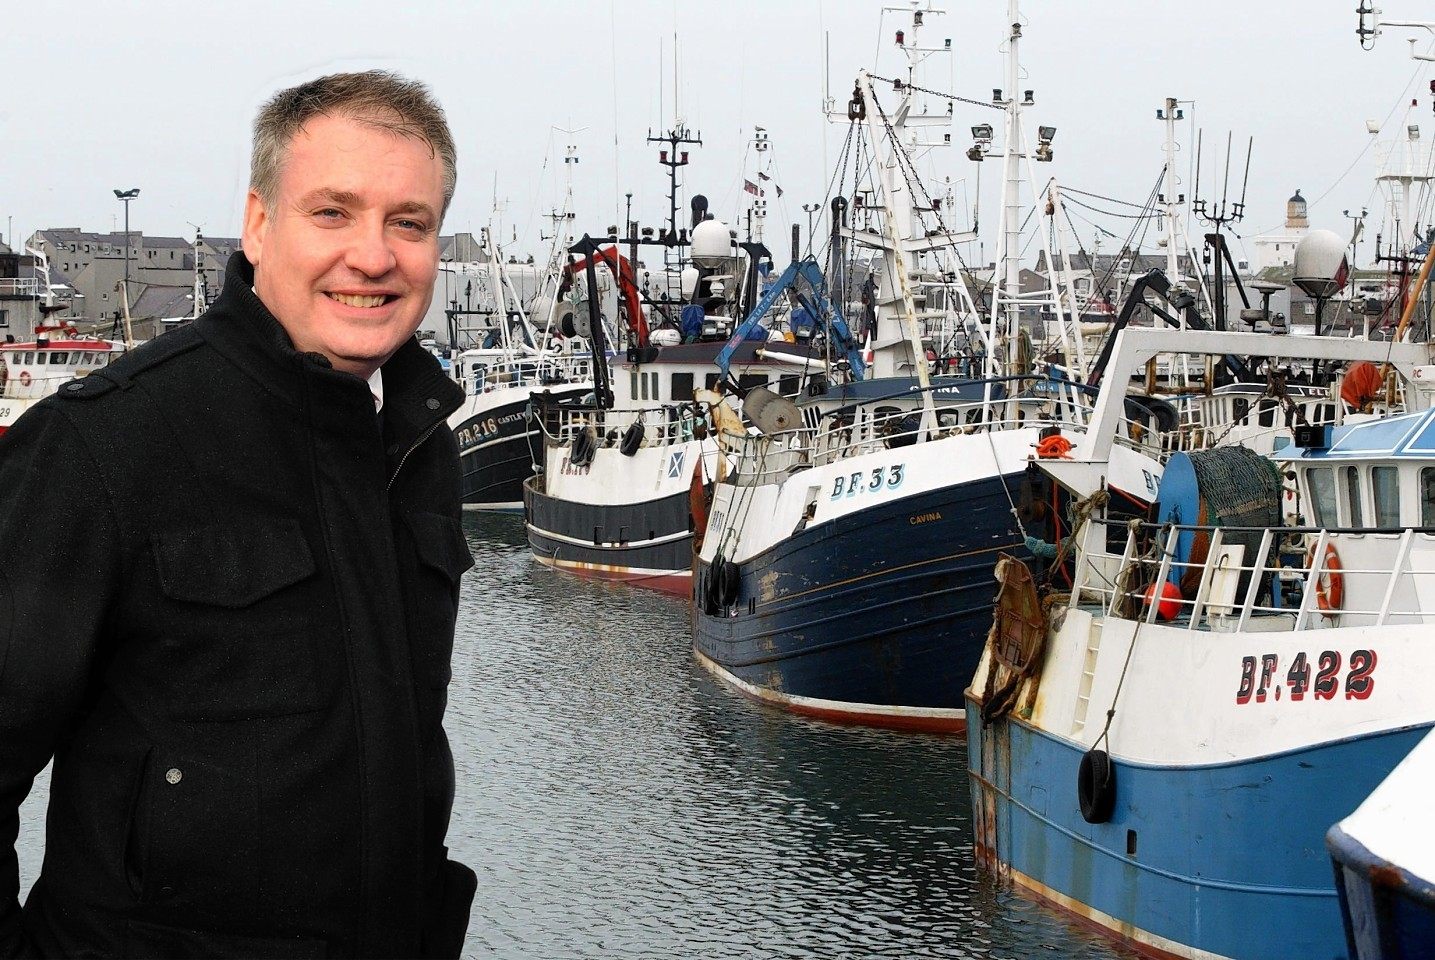 Fishing Minister Richard Lochhead